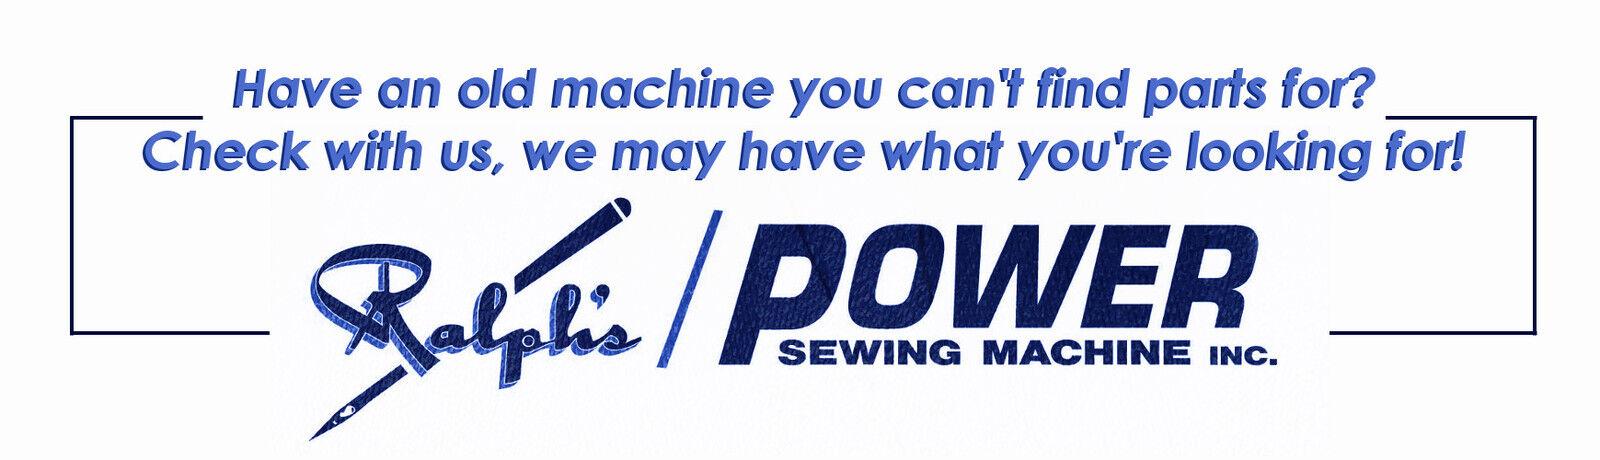 Ralphs Industrial Sewing